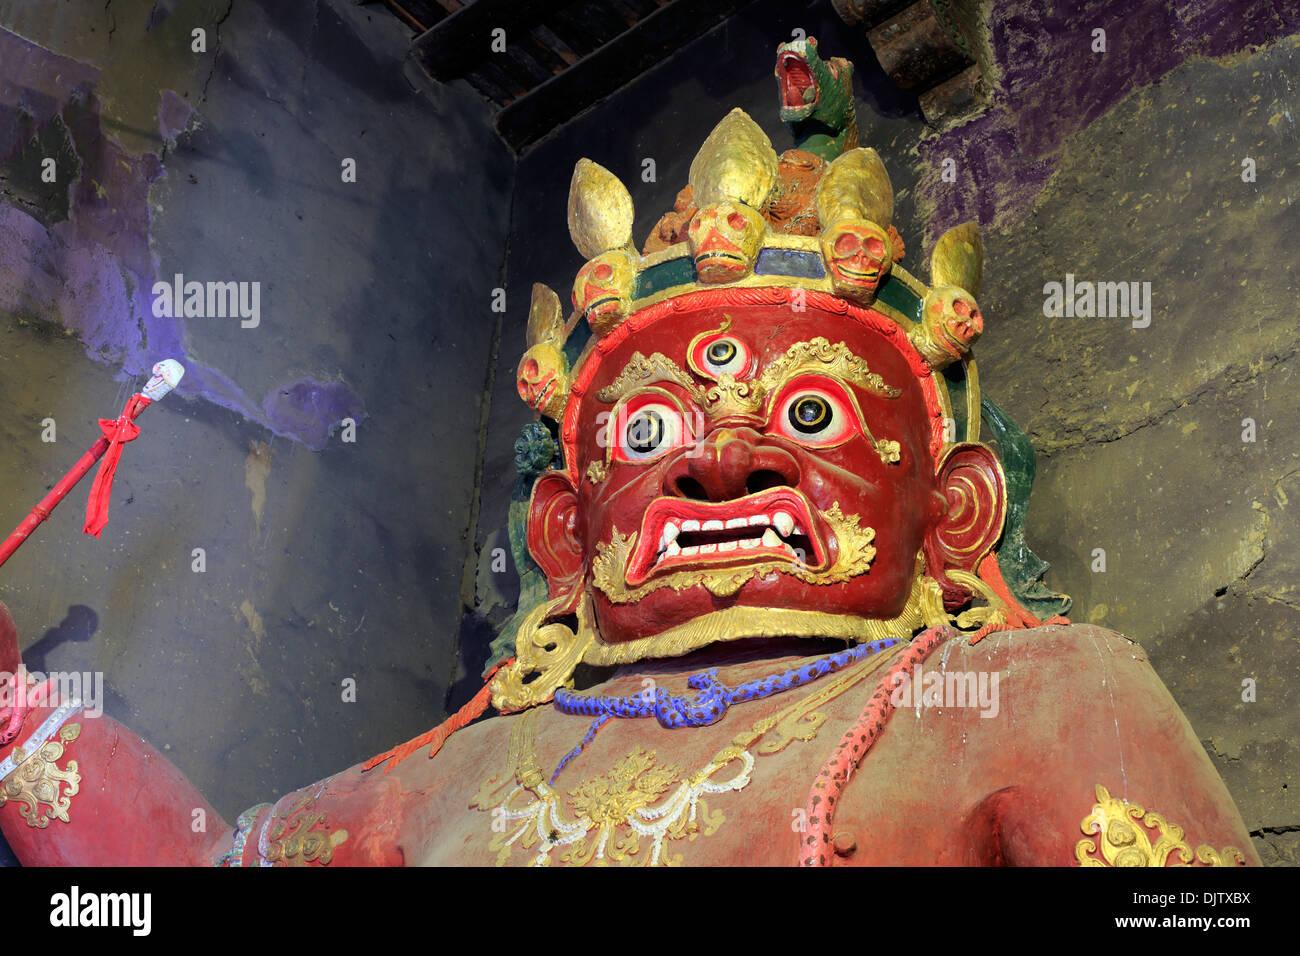 Statue of guardian god, Sakya Monastery, Shigatse Prefecture, Tibet, China - Stock Image